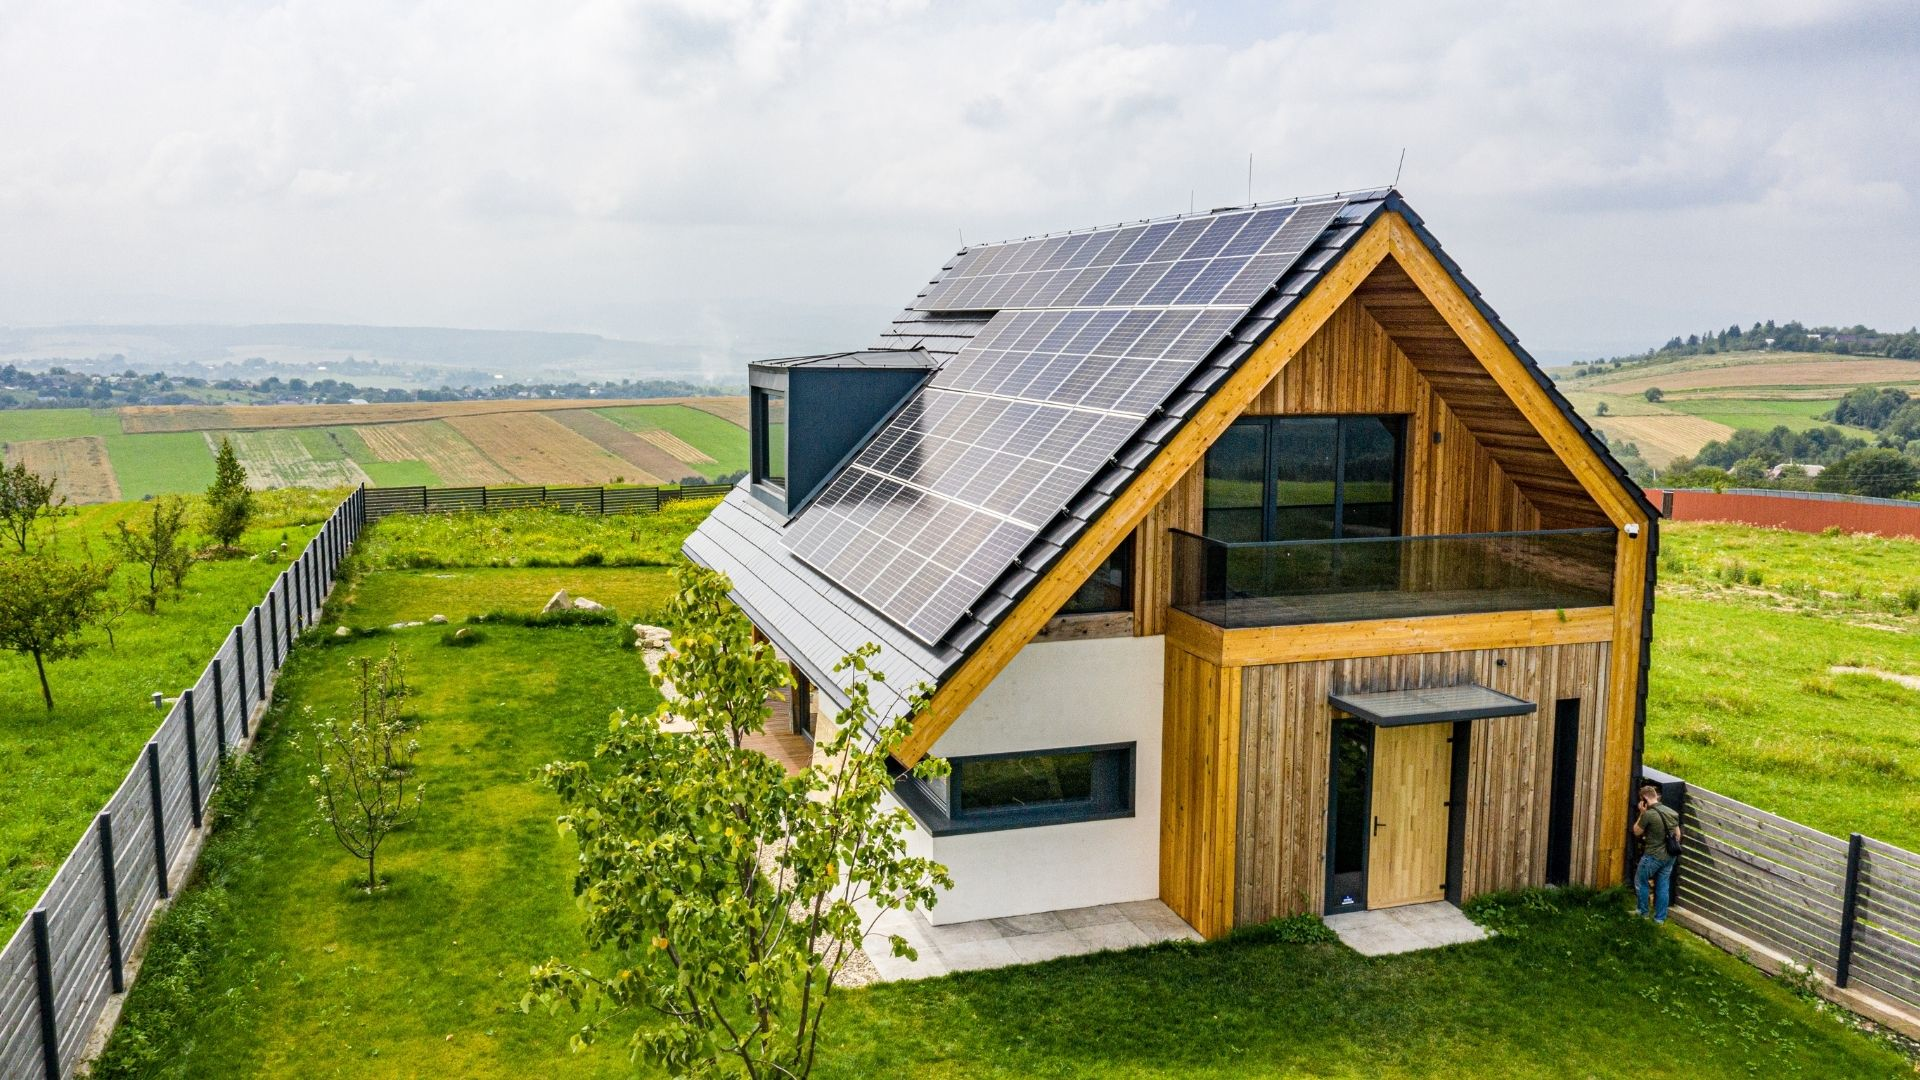 Eco home rural location